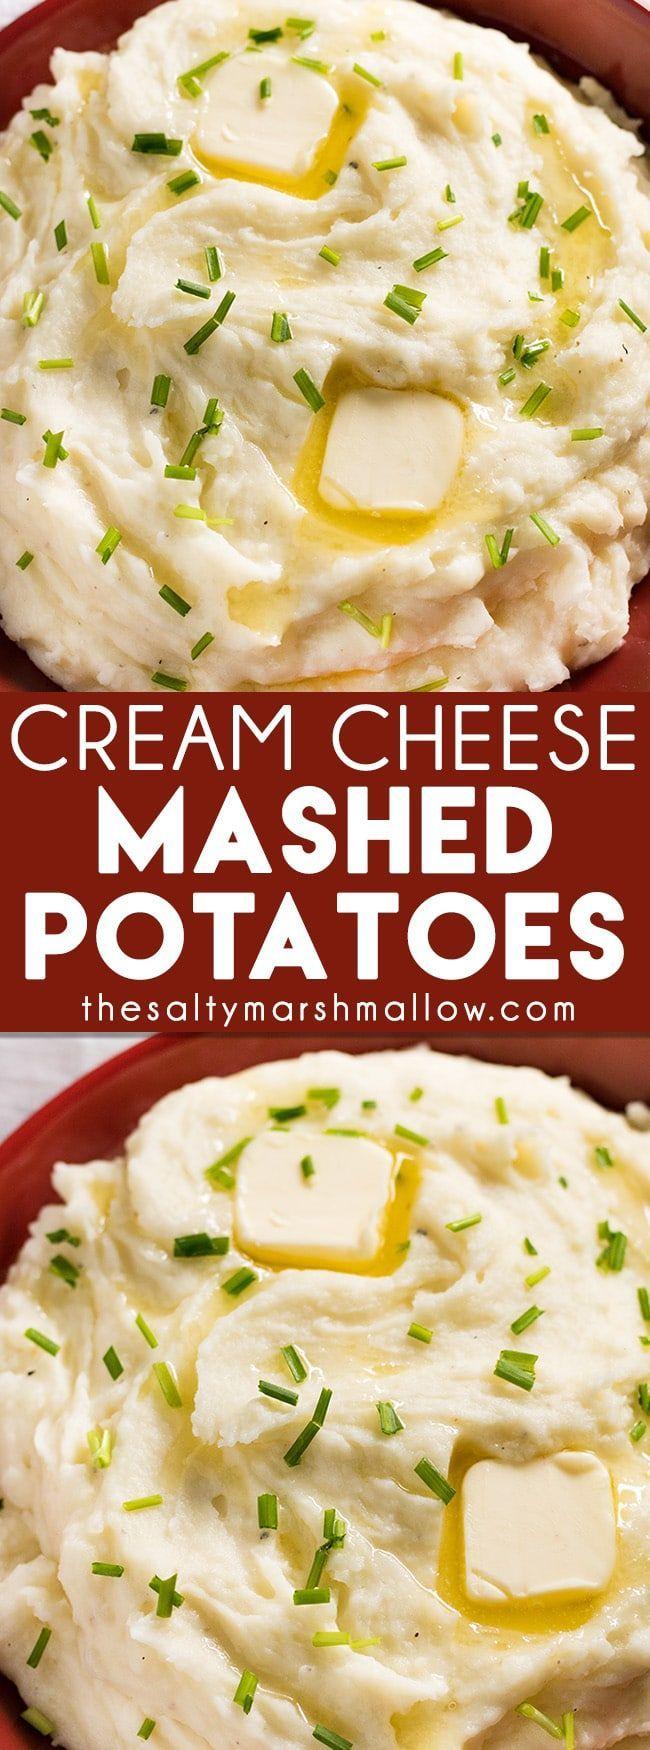 Cream Cheese Mashed Potatoes -